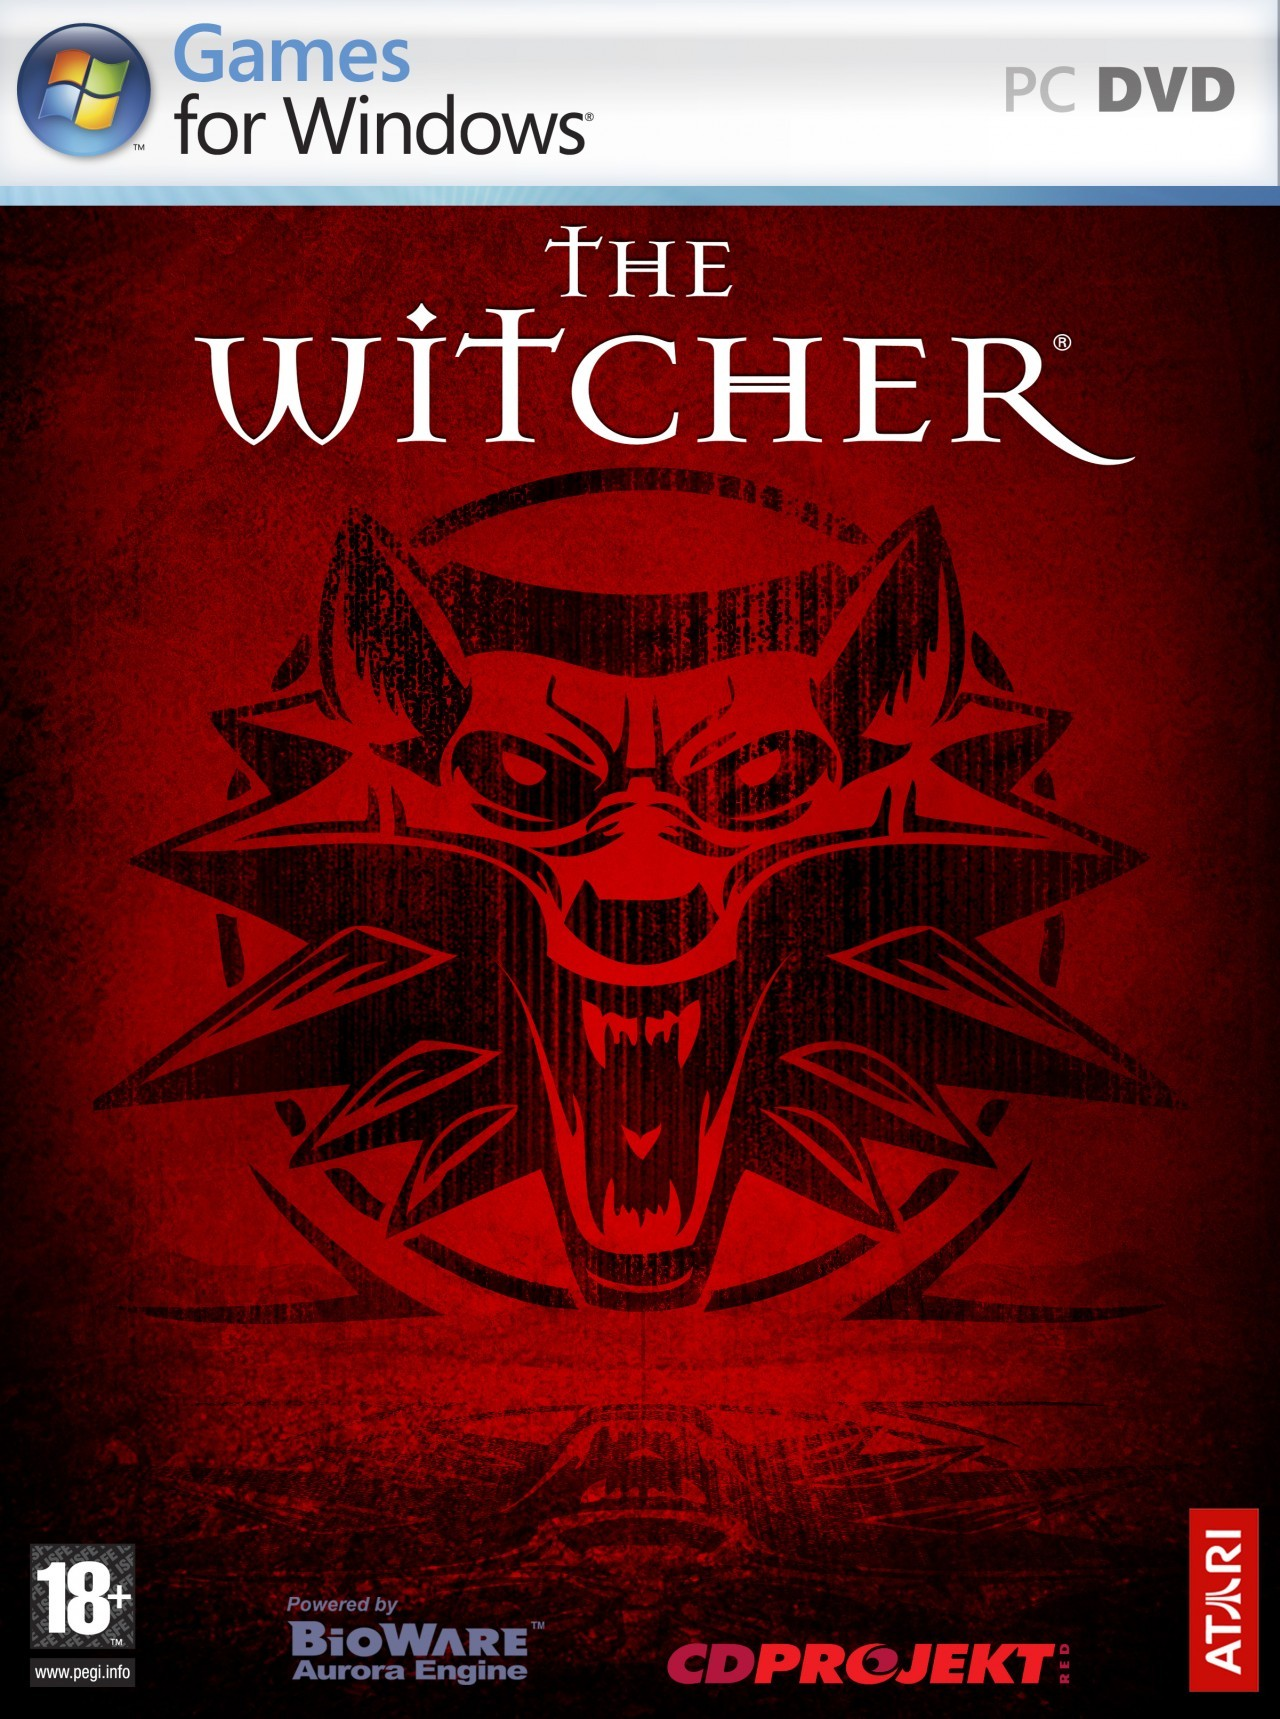 Fil:The Witcher EU box.jpg